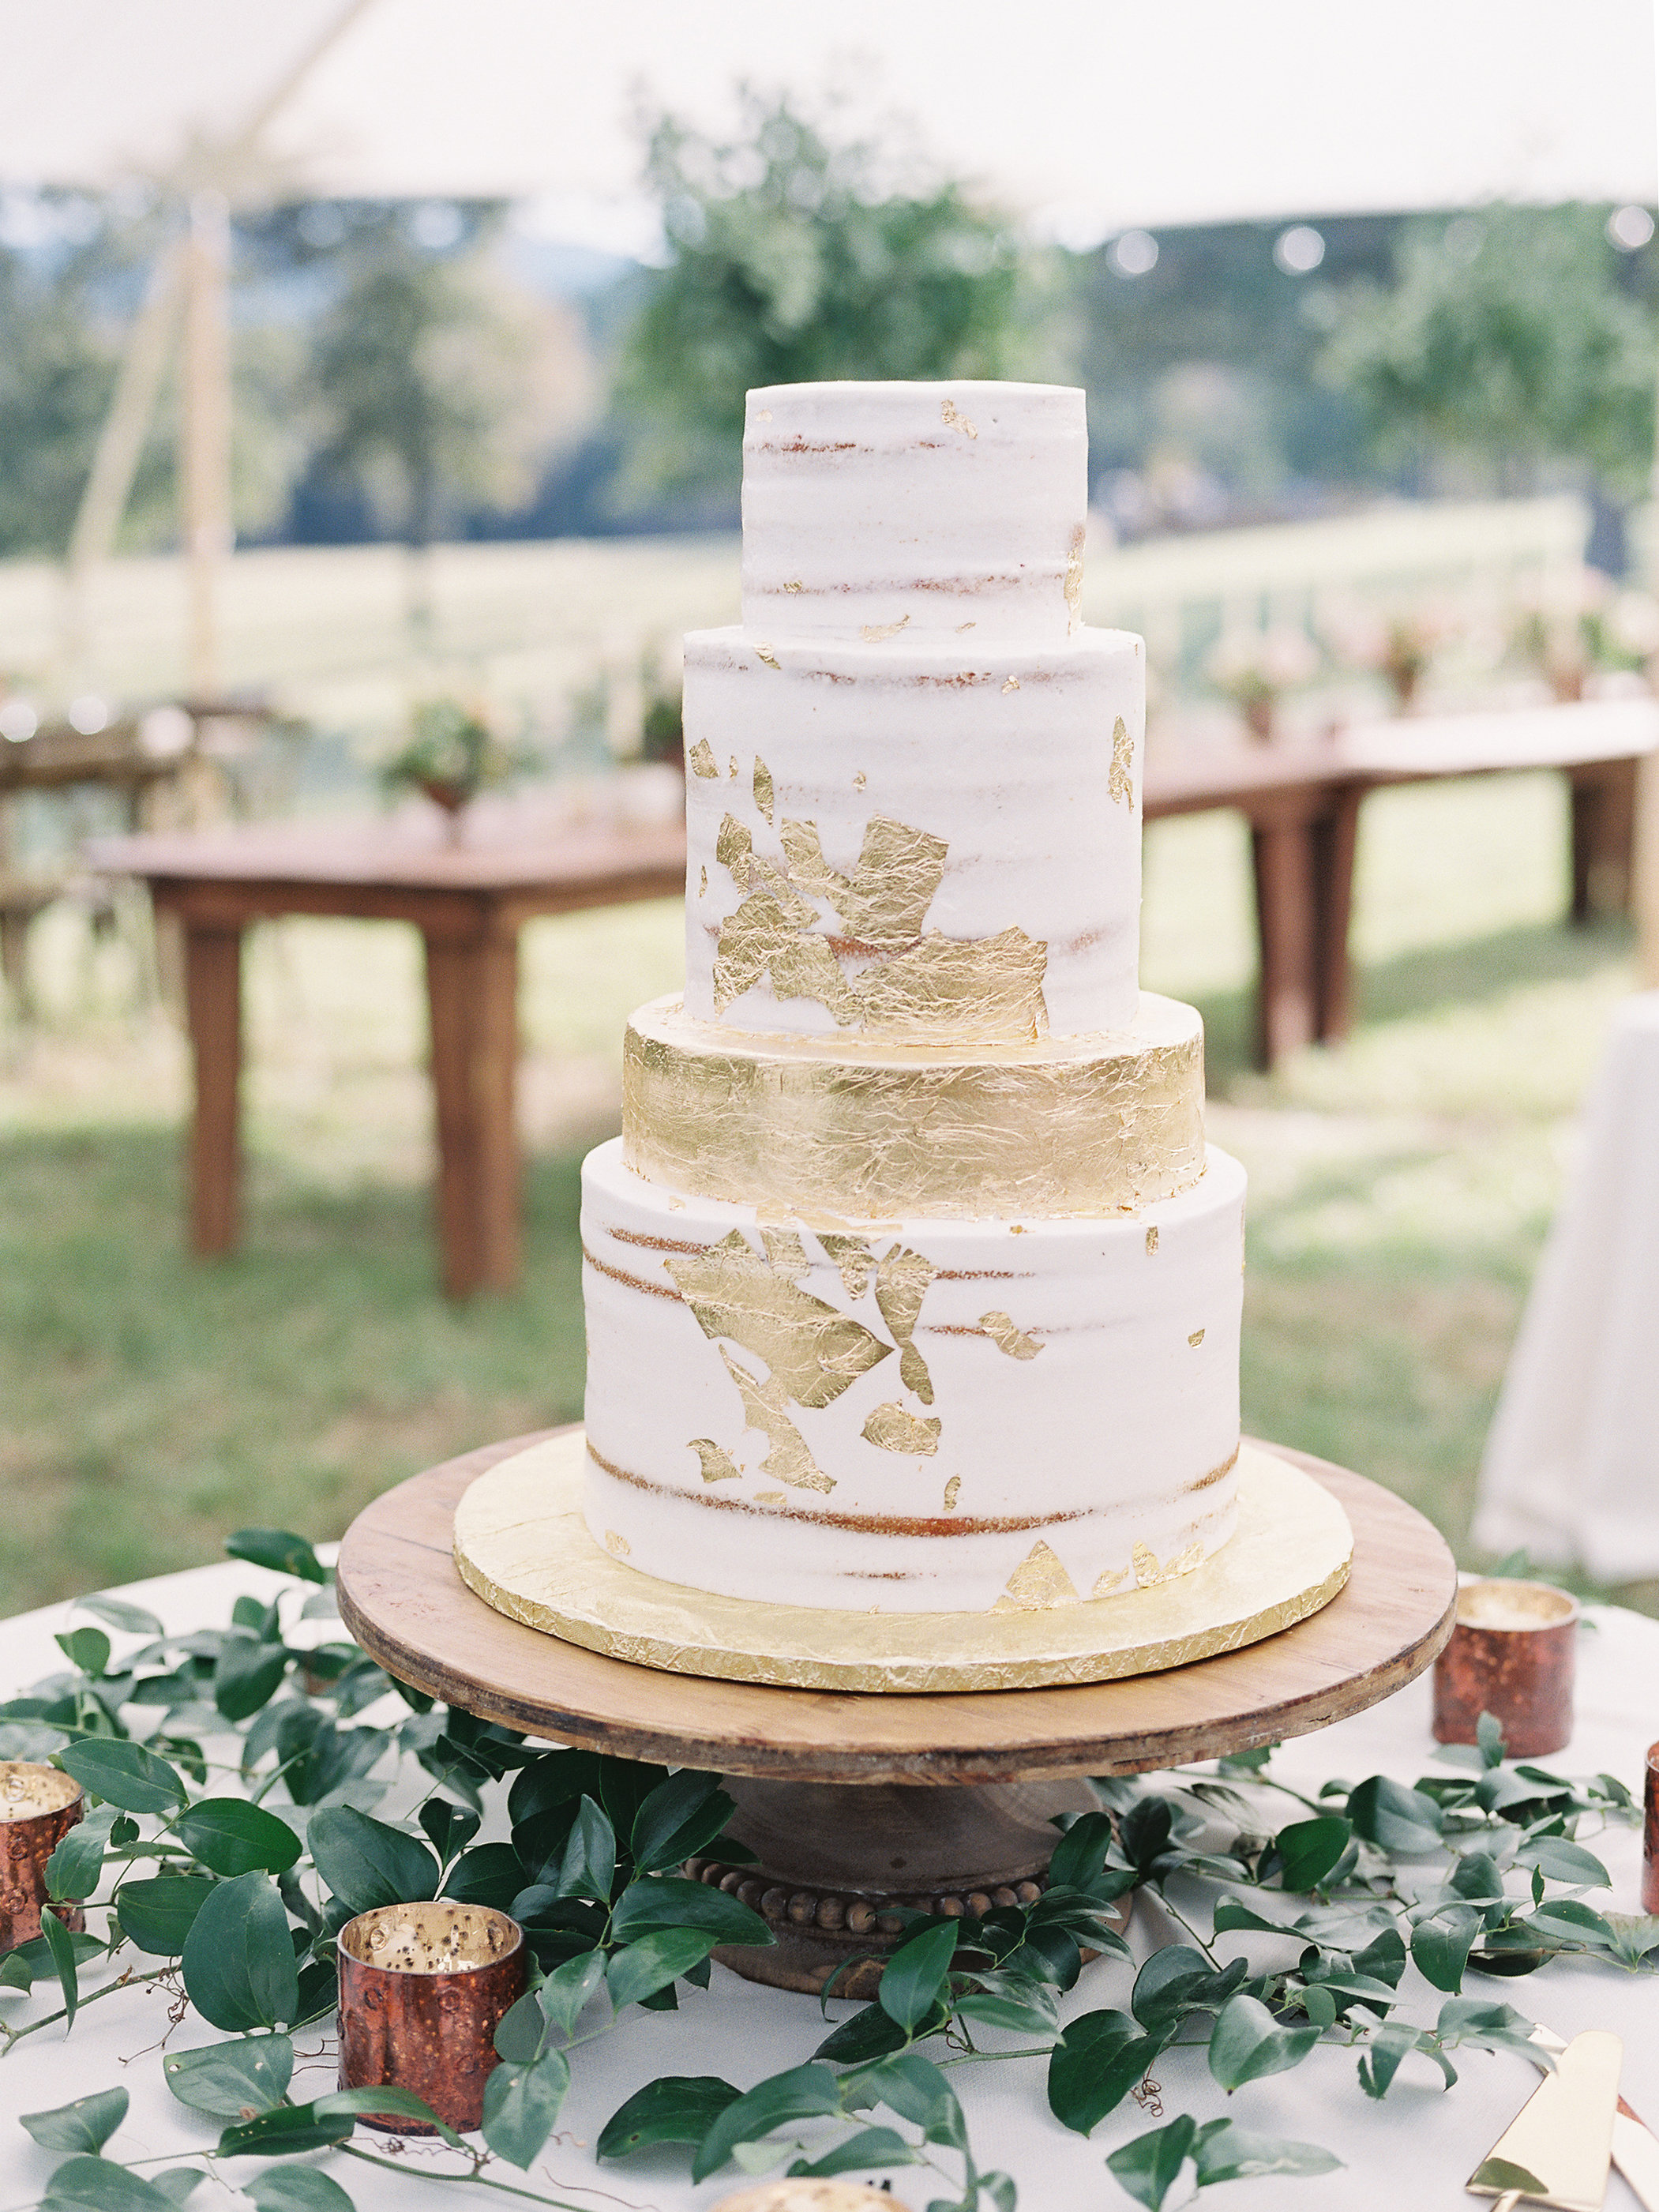 jessica-zimmerman-events-heather-payne-dan-and-shay-arkansas-wedding-cake.jpg